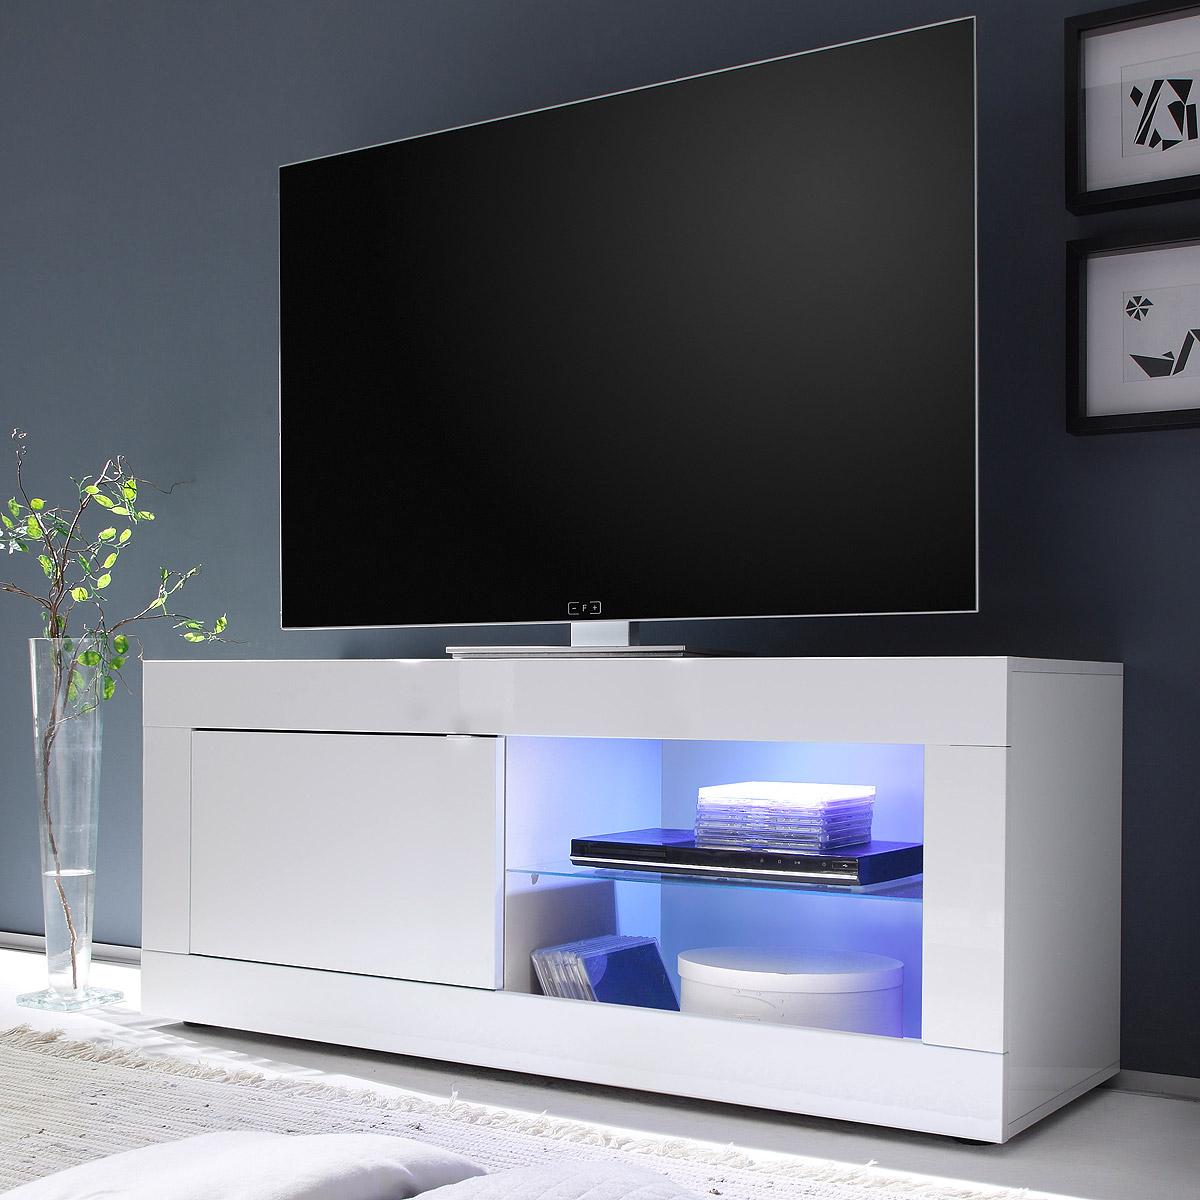 tv element basic tv board lowboard kommode wei lackiert breite 140 cm ebay. Black Bedroom Furniture Sets. Home Design Ideas